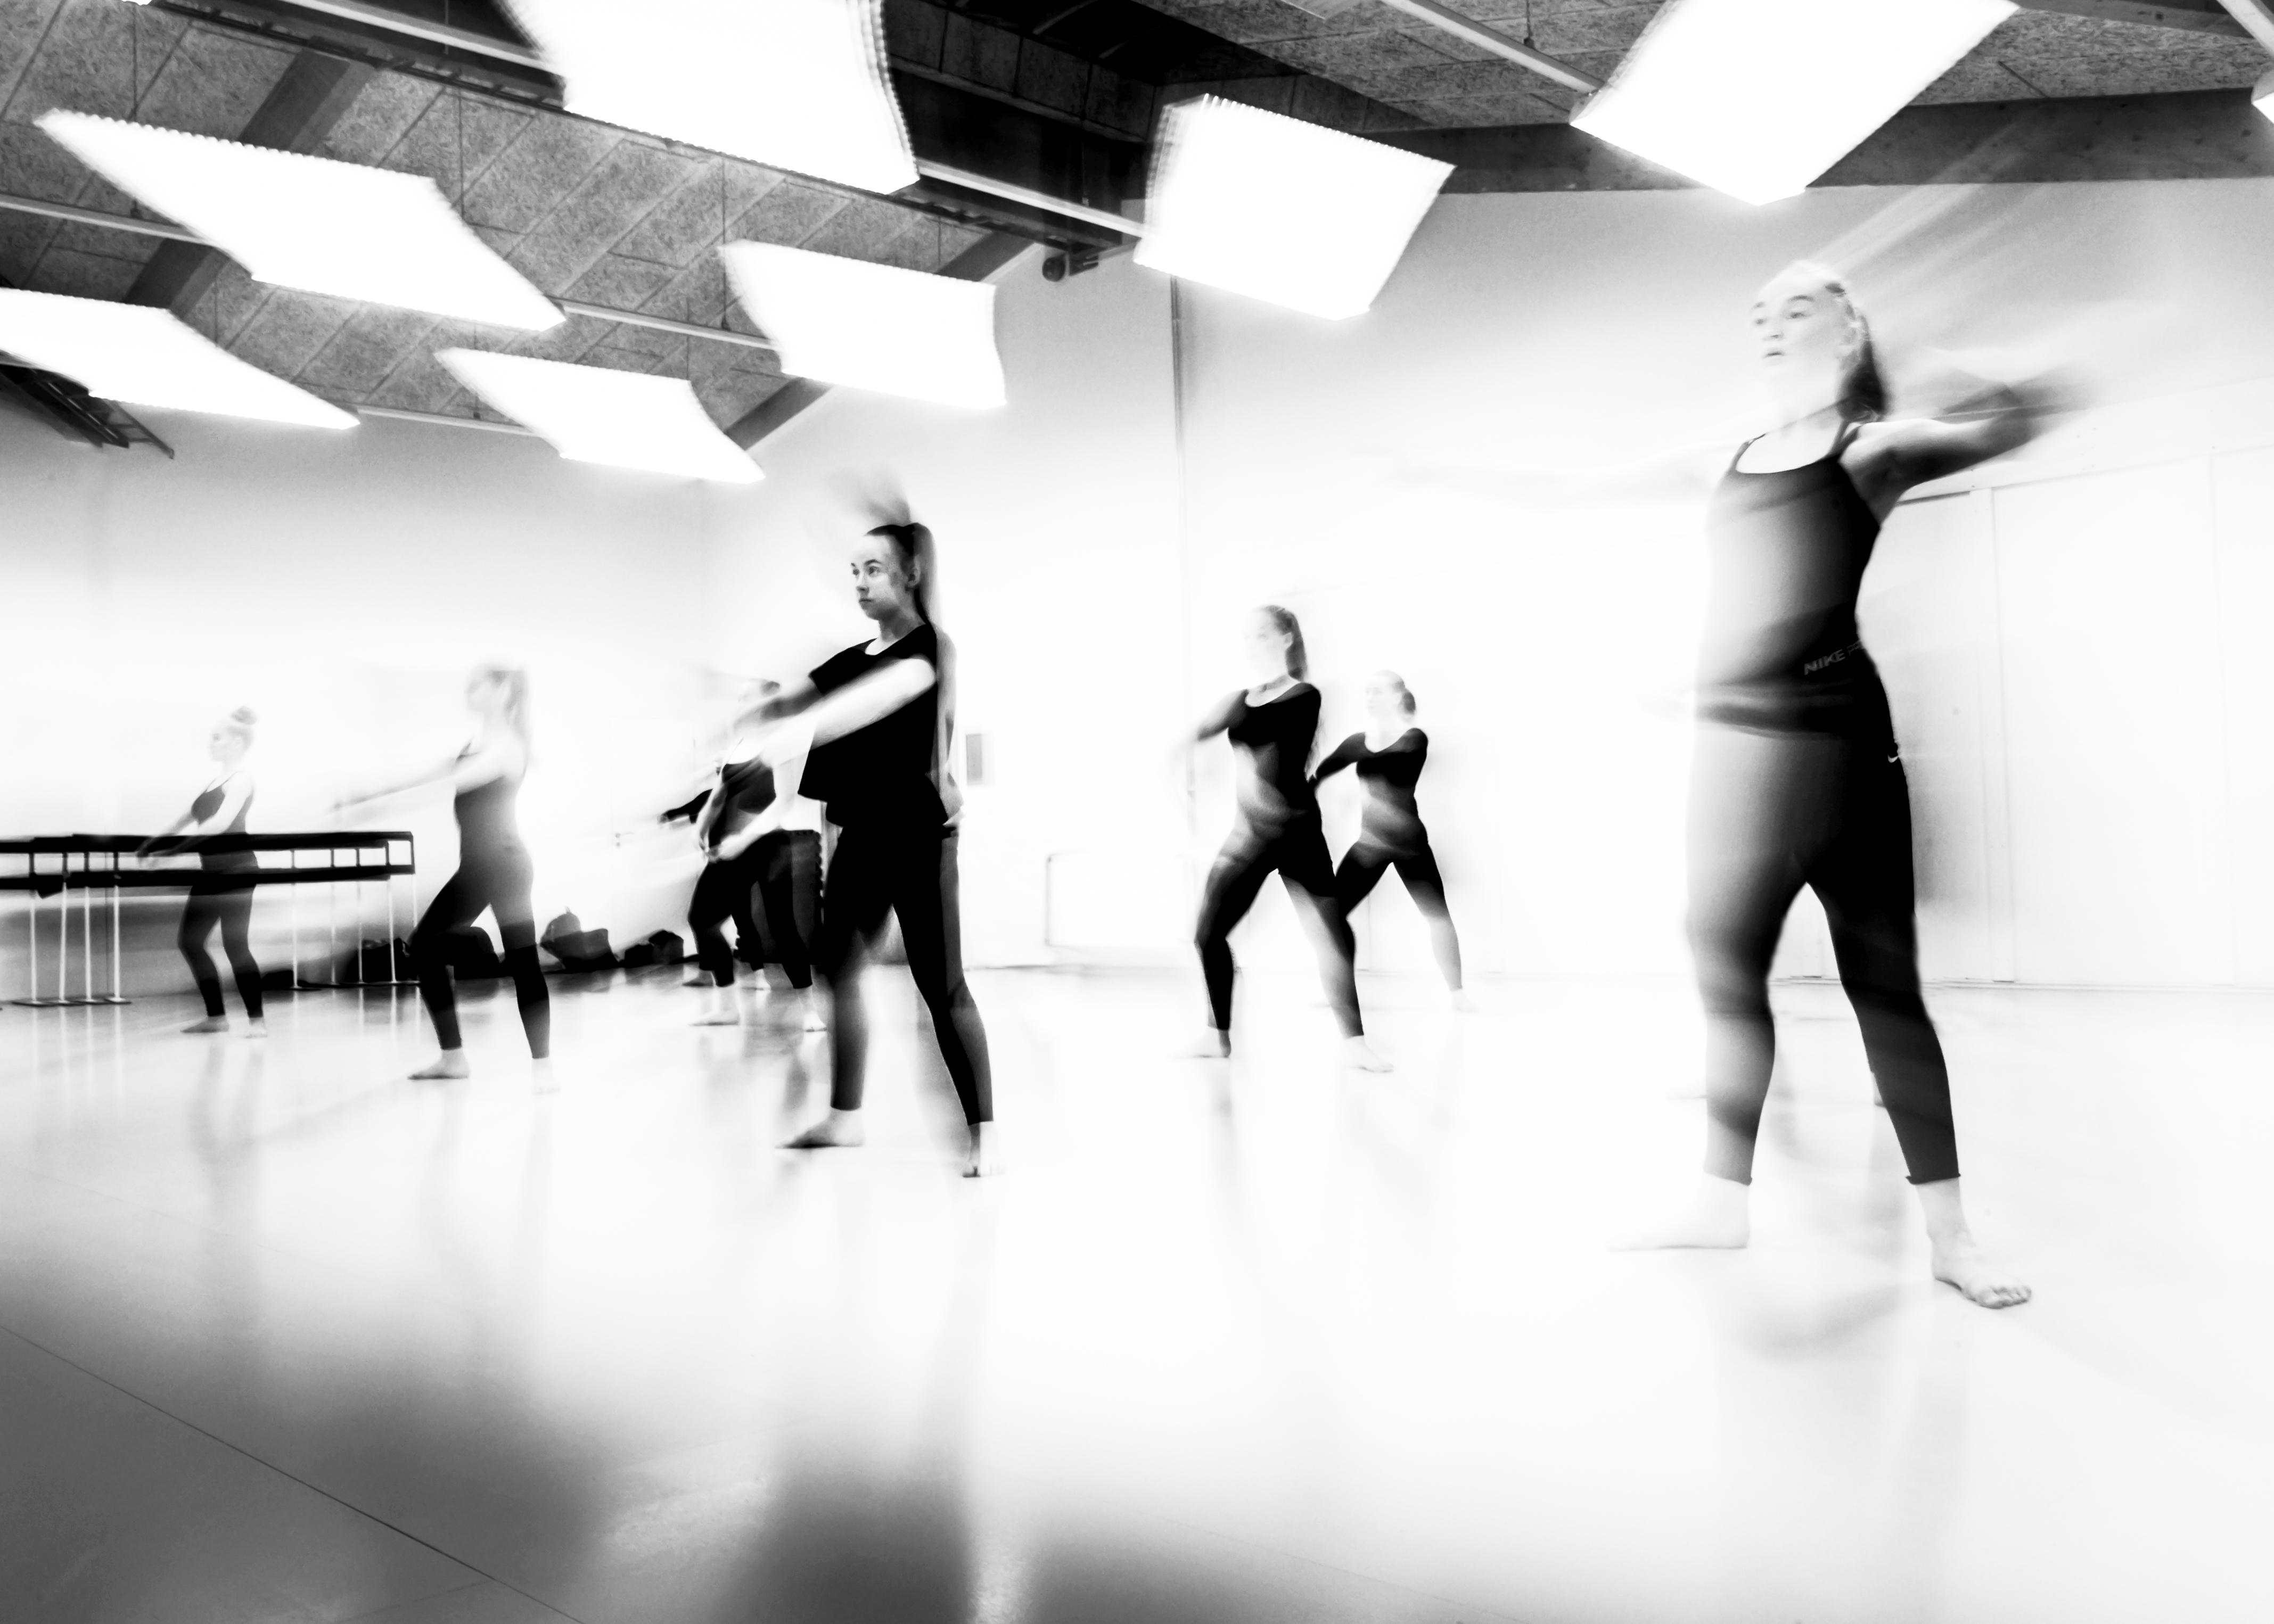 DansKompani Reykjanesbæ